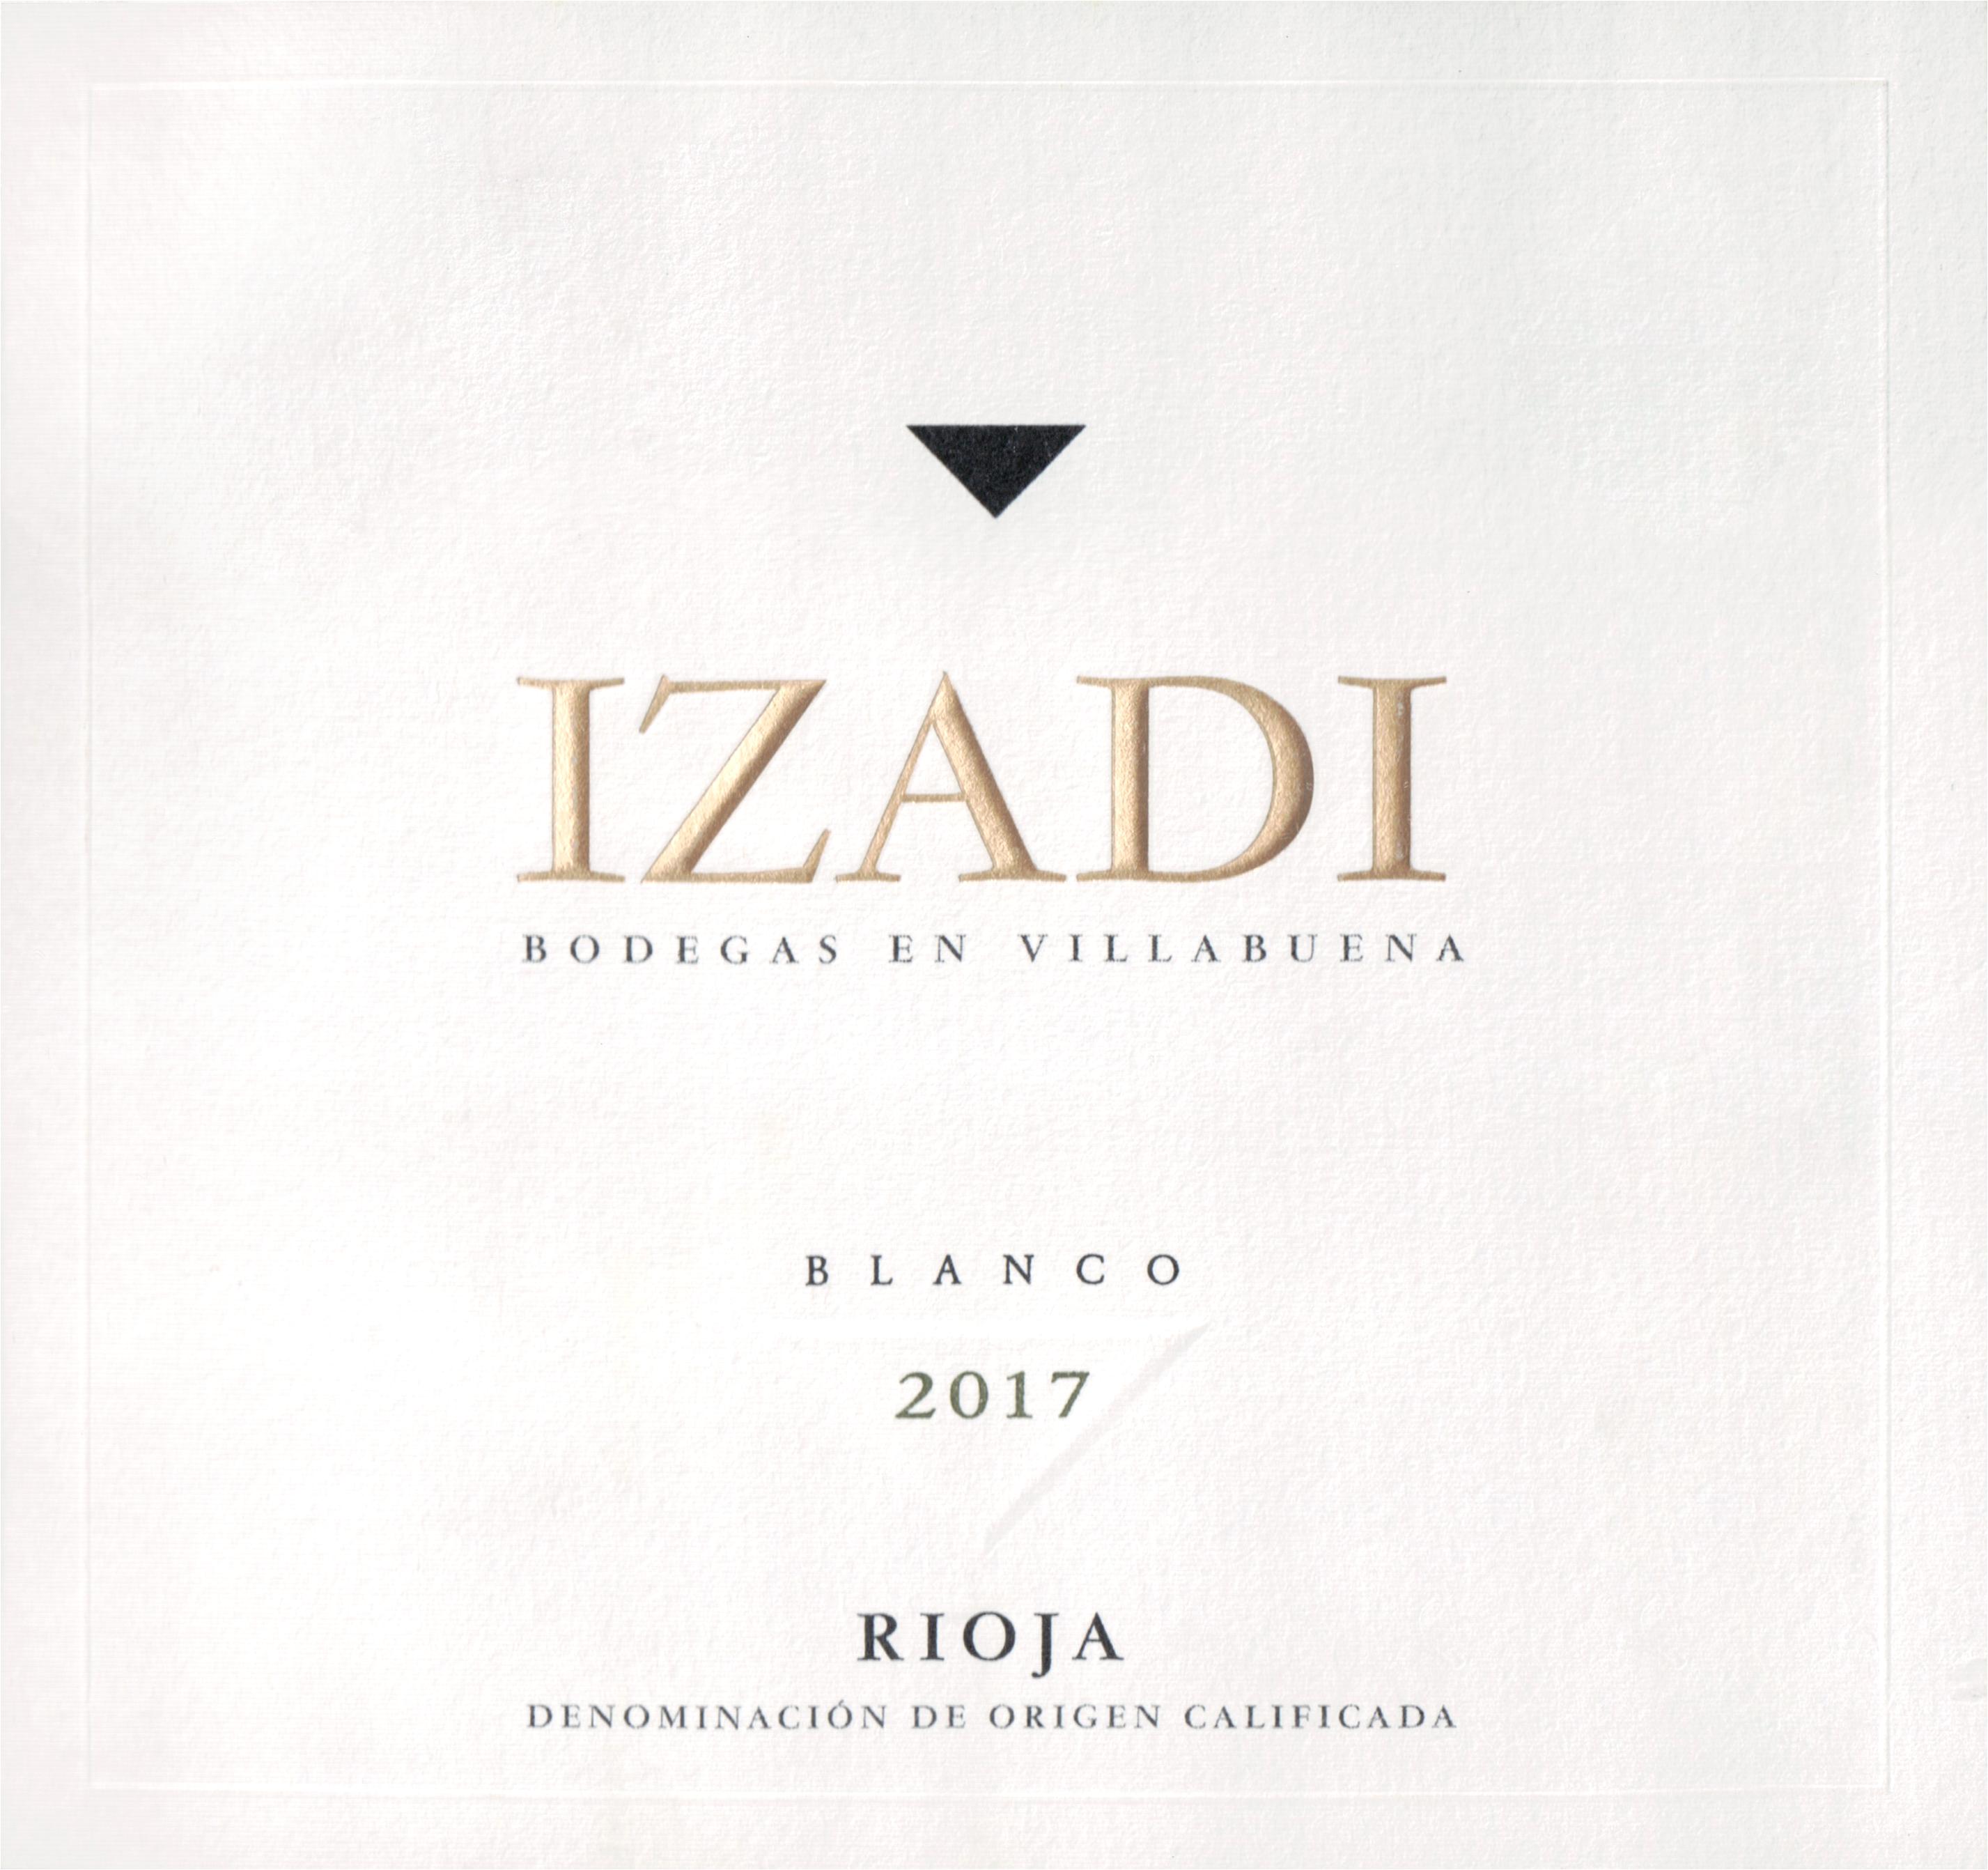 Bodegas Izadi Rioja Blanco 2017